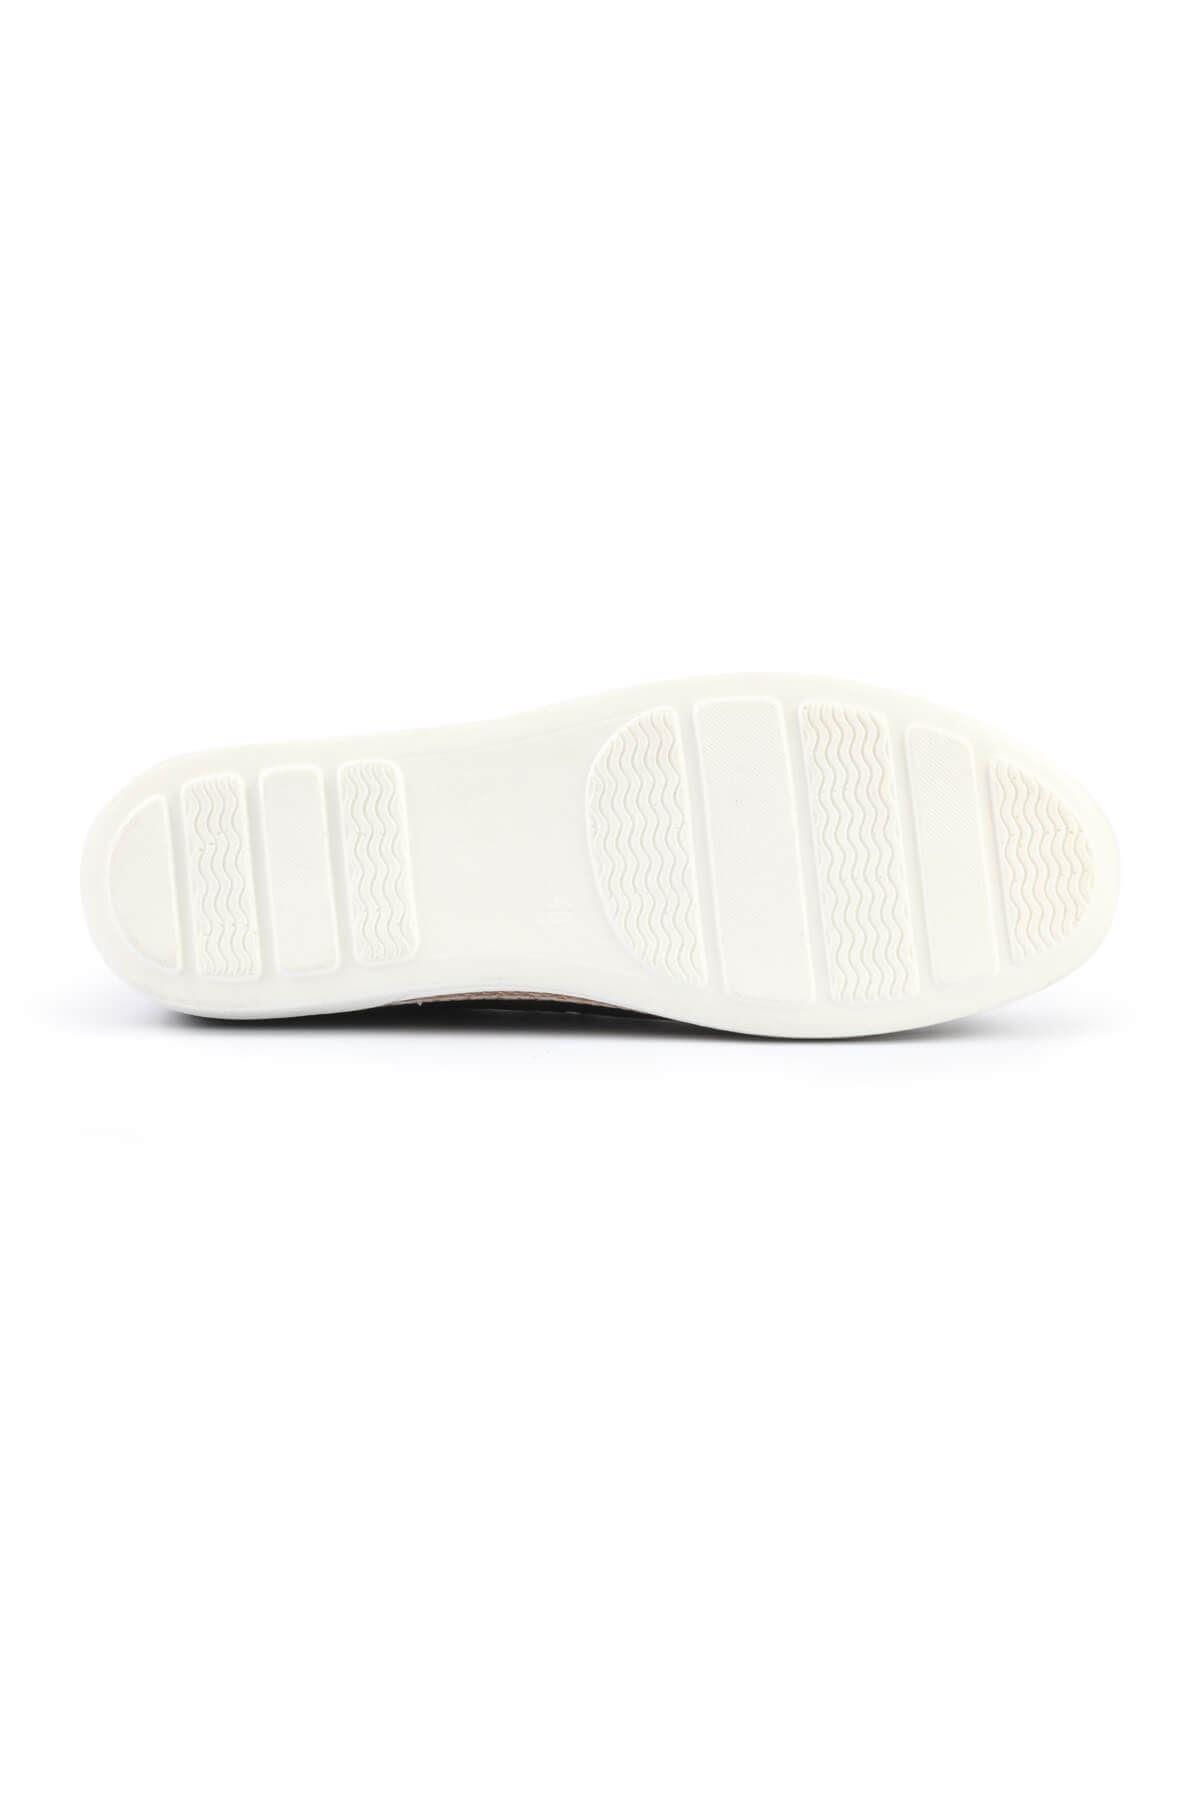 Libero C825 Tan Loafer Shoes